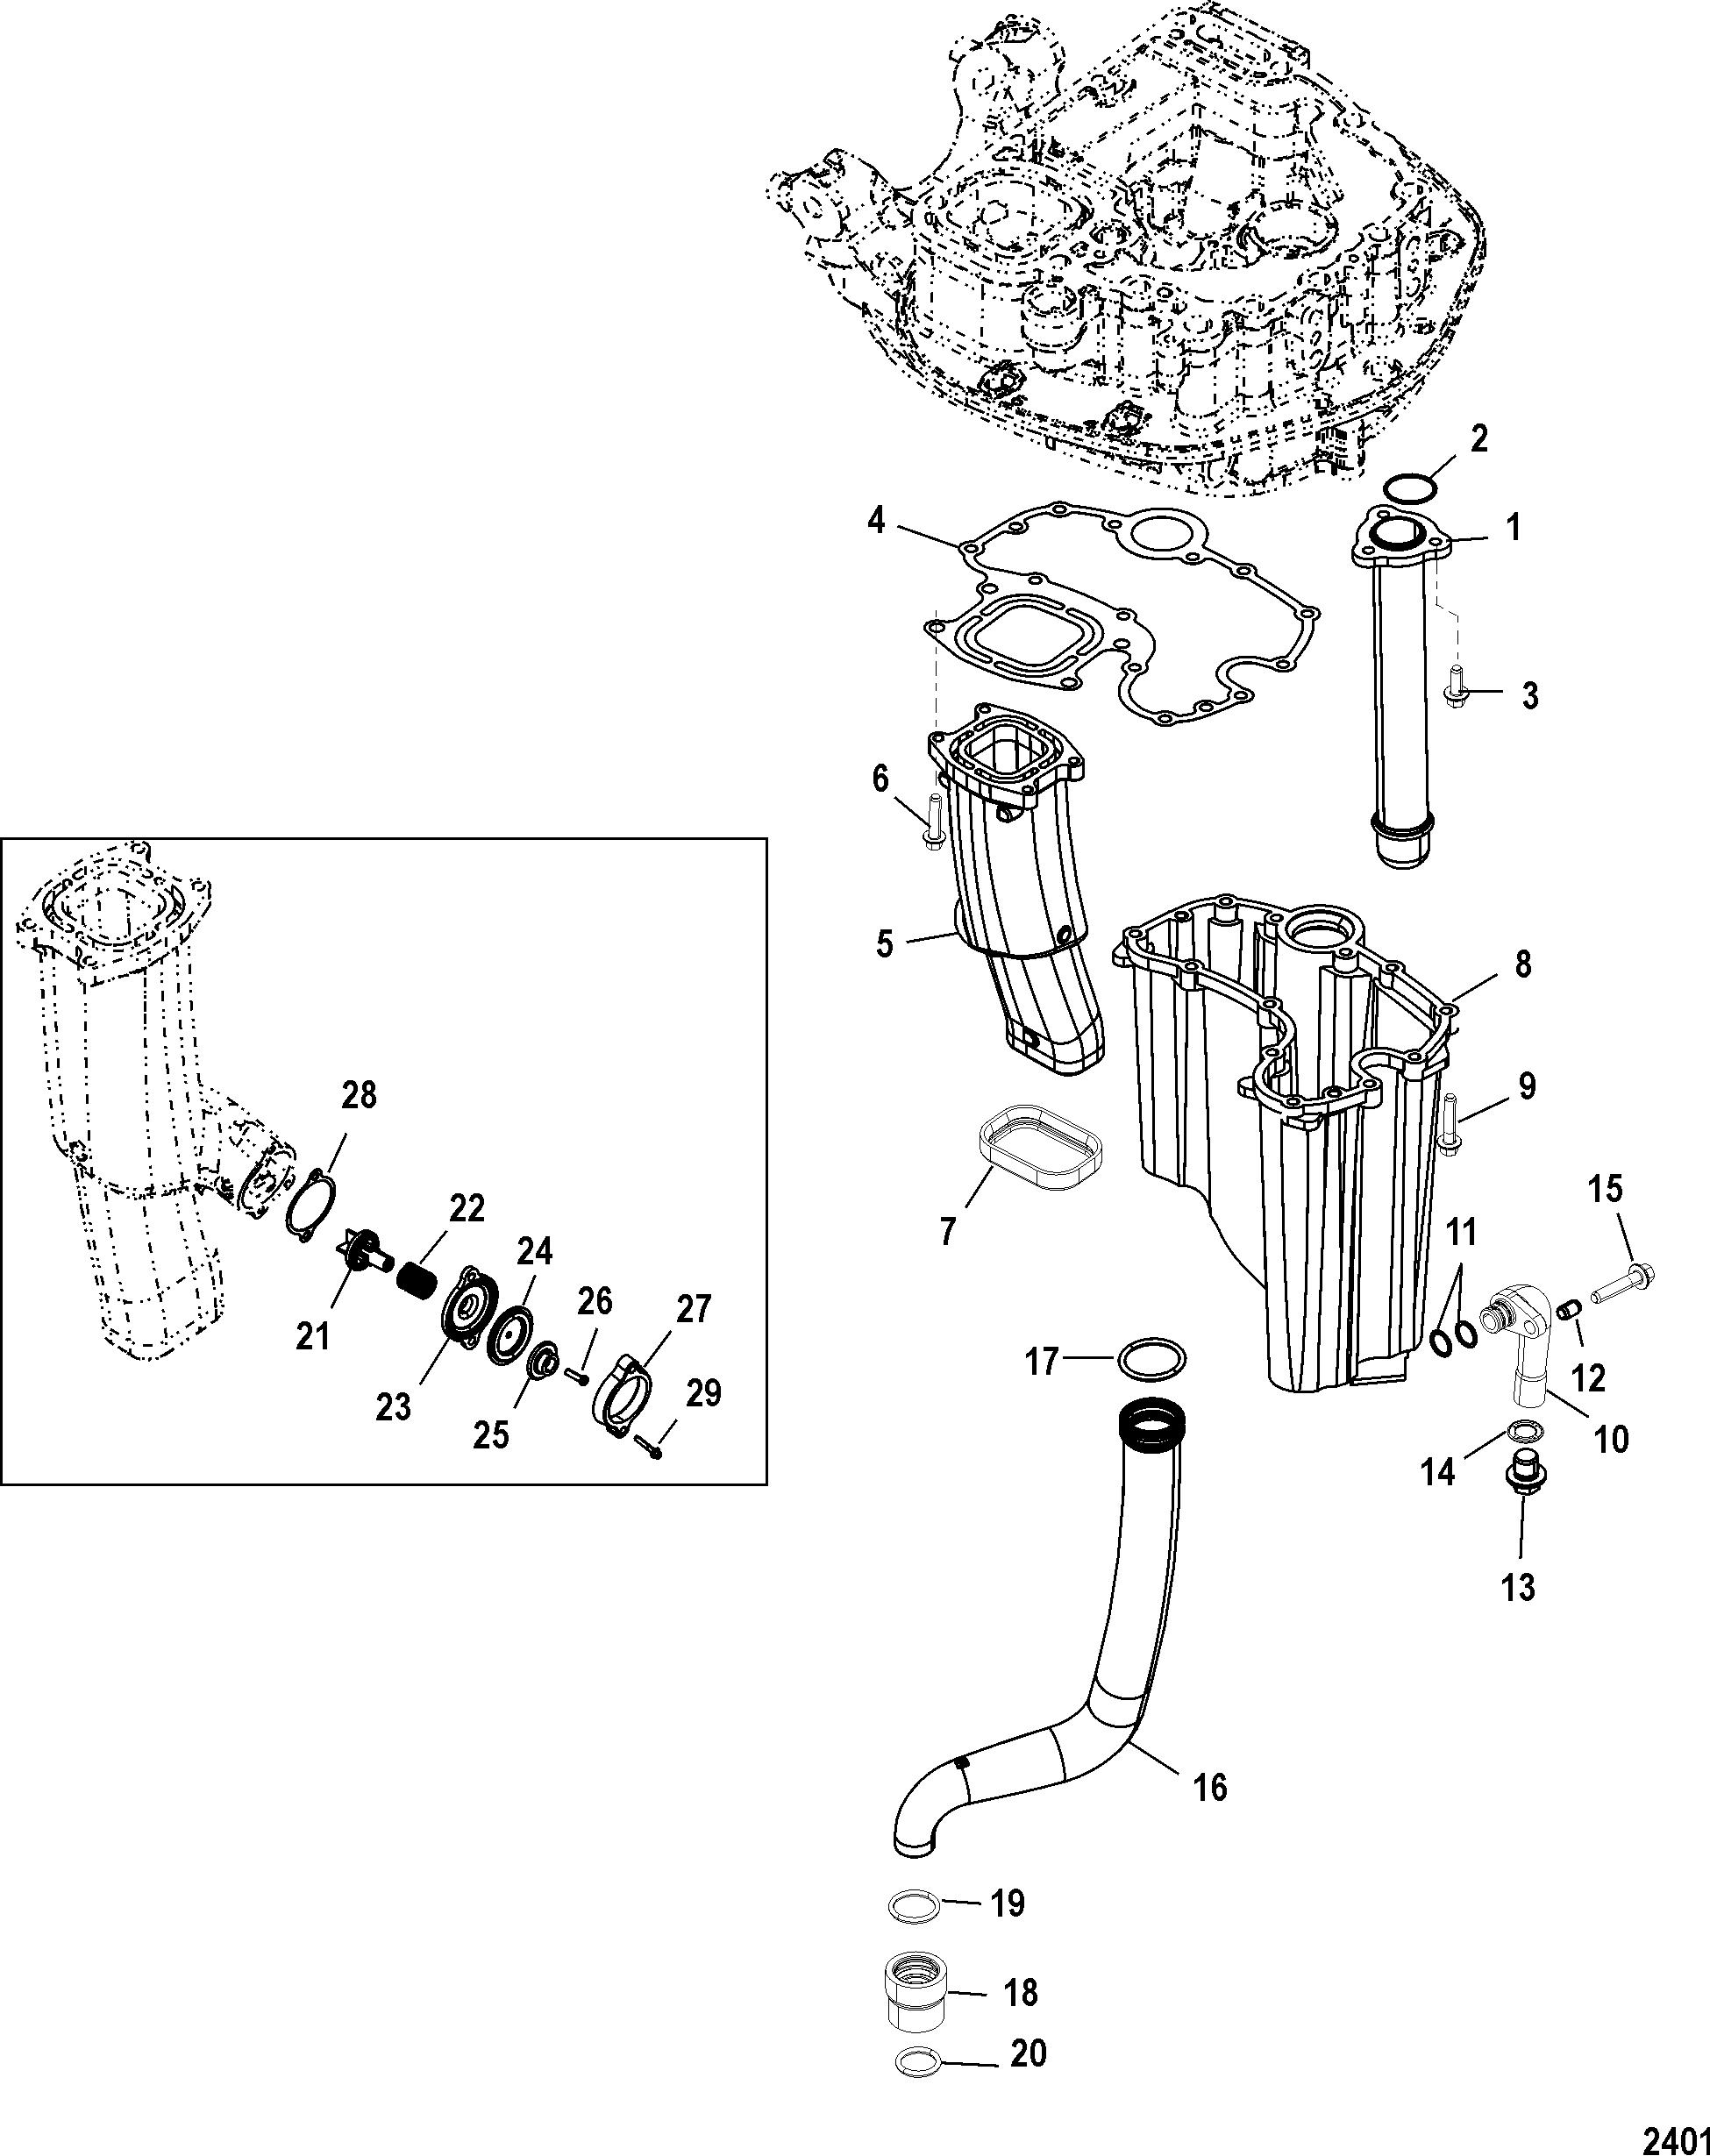 Verado 12 Pin Wiring Harness | Wiring Schematic Diagram on dual car stereo, dual car radio wire hanes's, dual car amp wiring diagram, pioneer car stereo connector diagram, dual xd1228 wiring harness, jaguar radio diagram, xdma7650 wire diagram, dual car speakers,